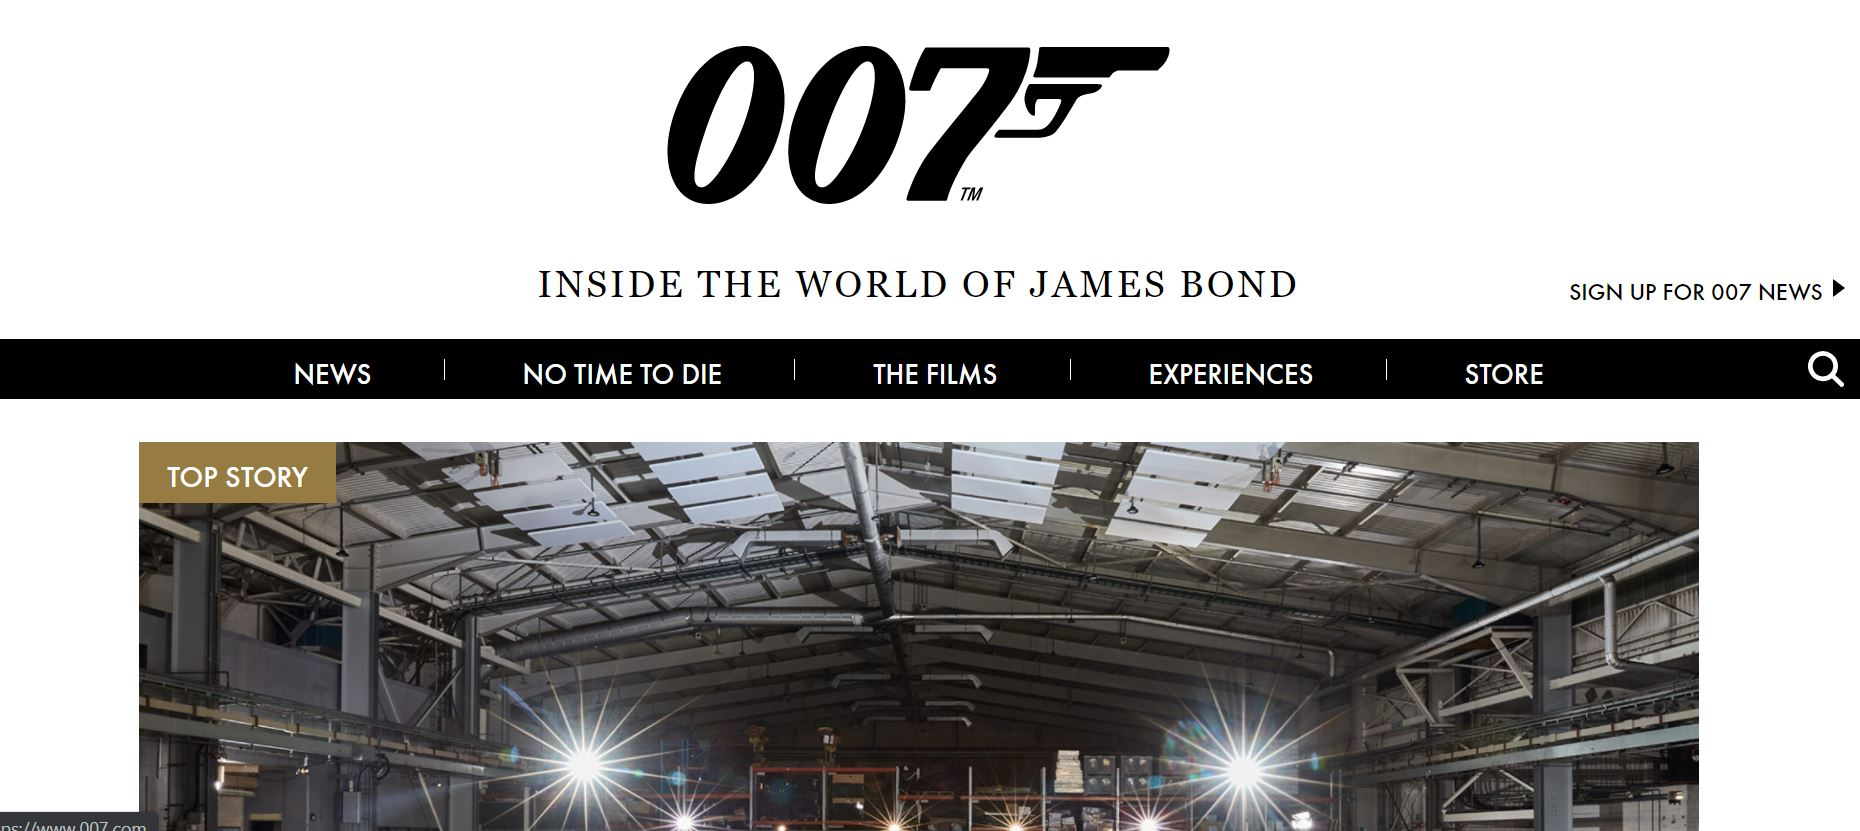 James Bond website